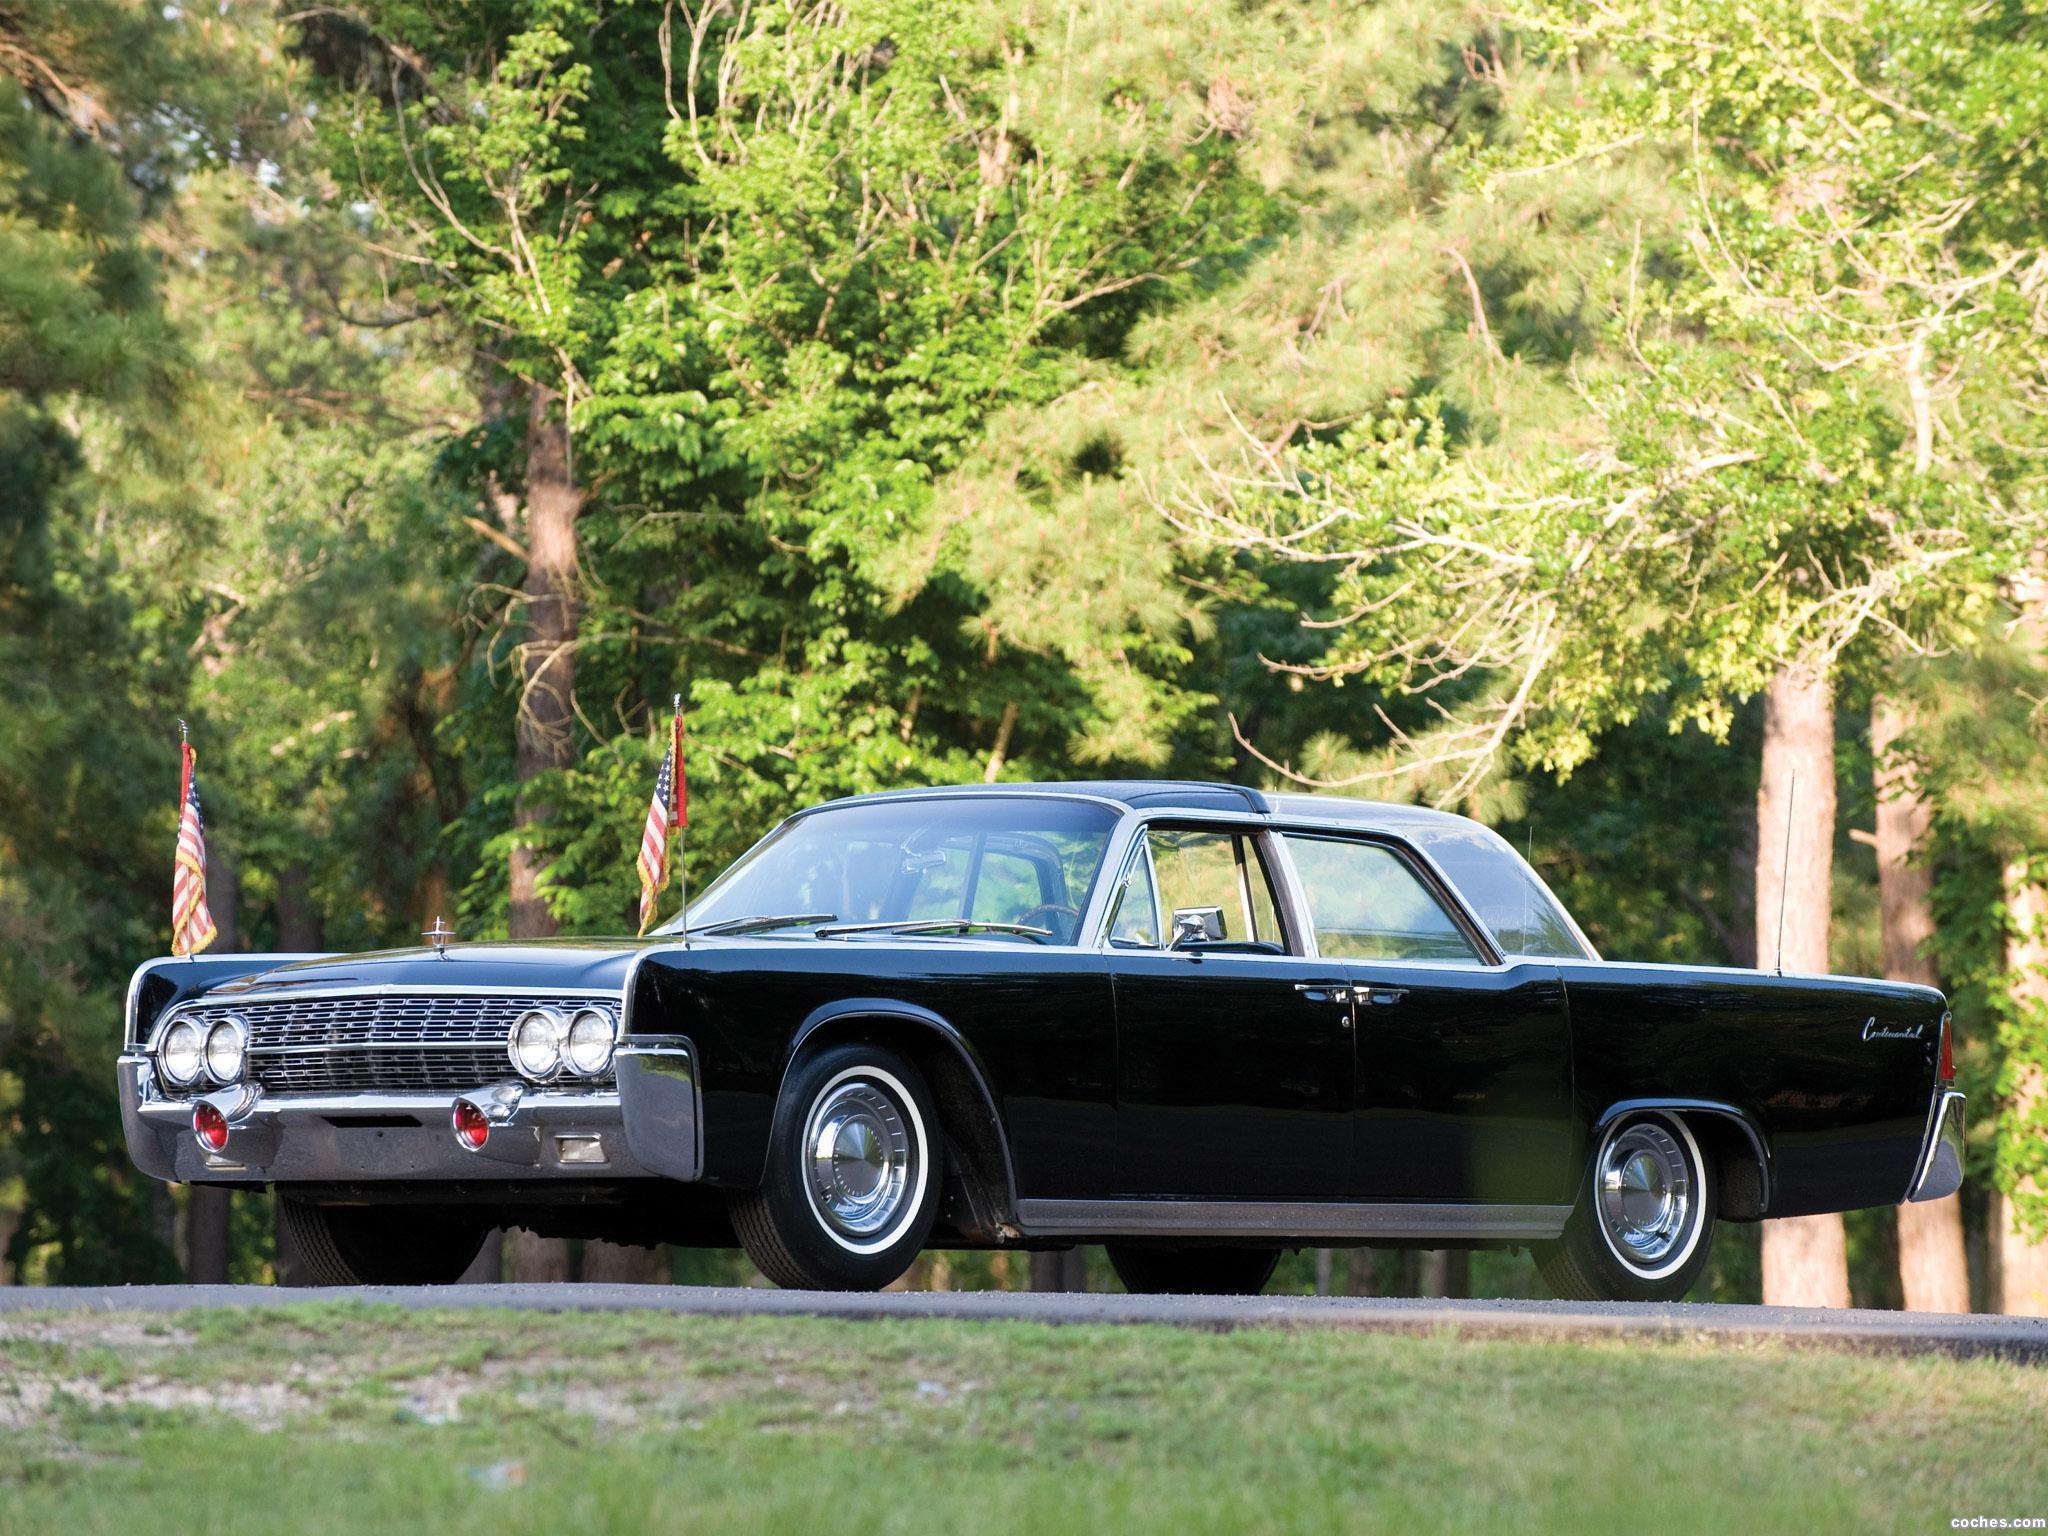 fotos de lincoln continental bubbletop kennedy limousine 1962. Black Bedroom Furniture Sets. Home Design Ideas